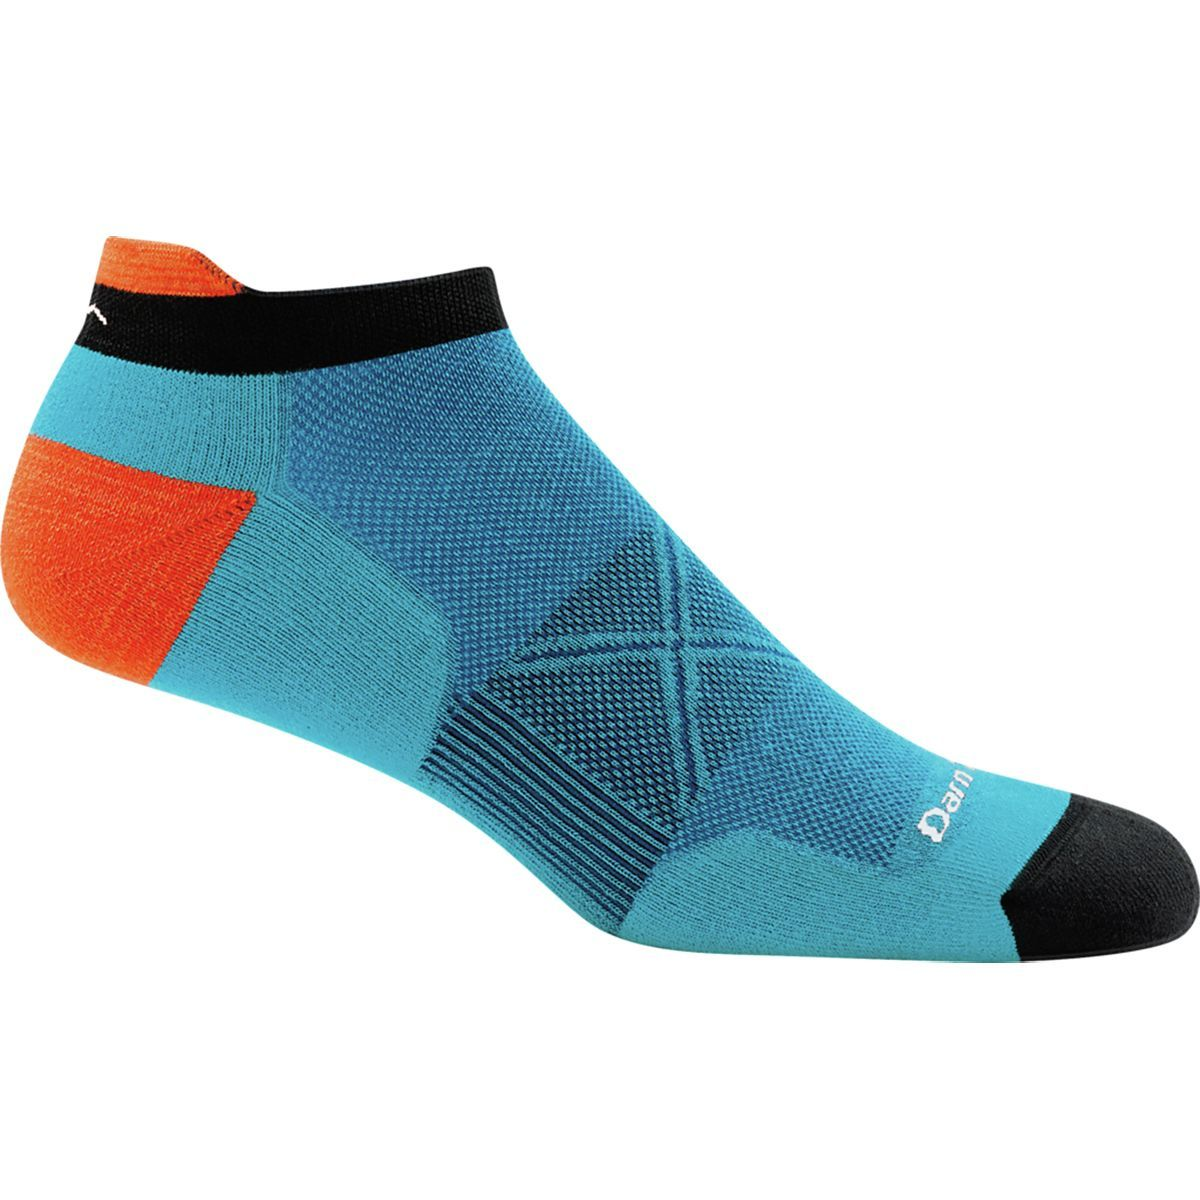 Darn Tough Vertex Stipe No Show Tab Ultra-Light Sock - Men's